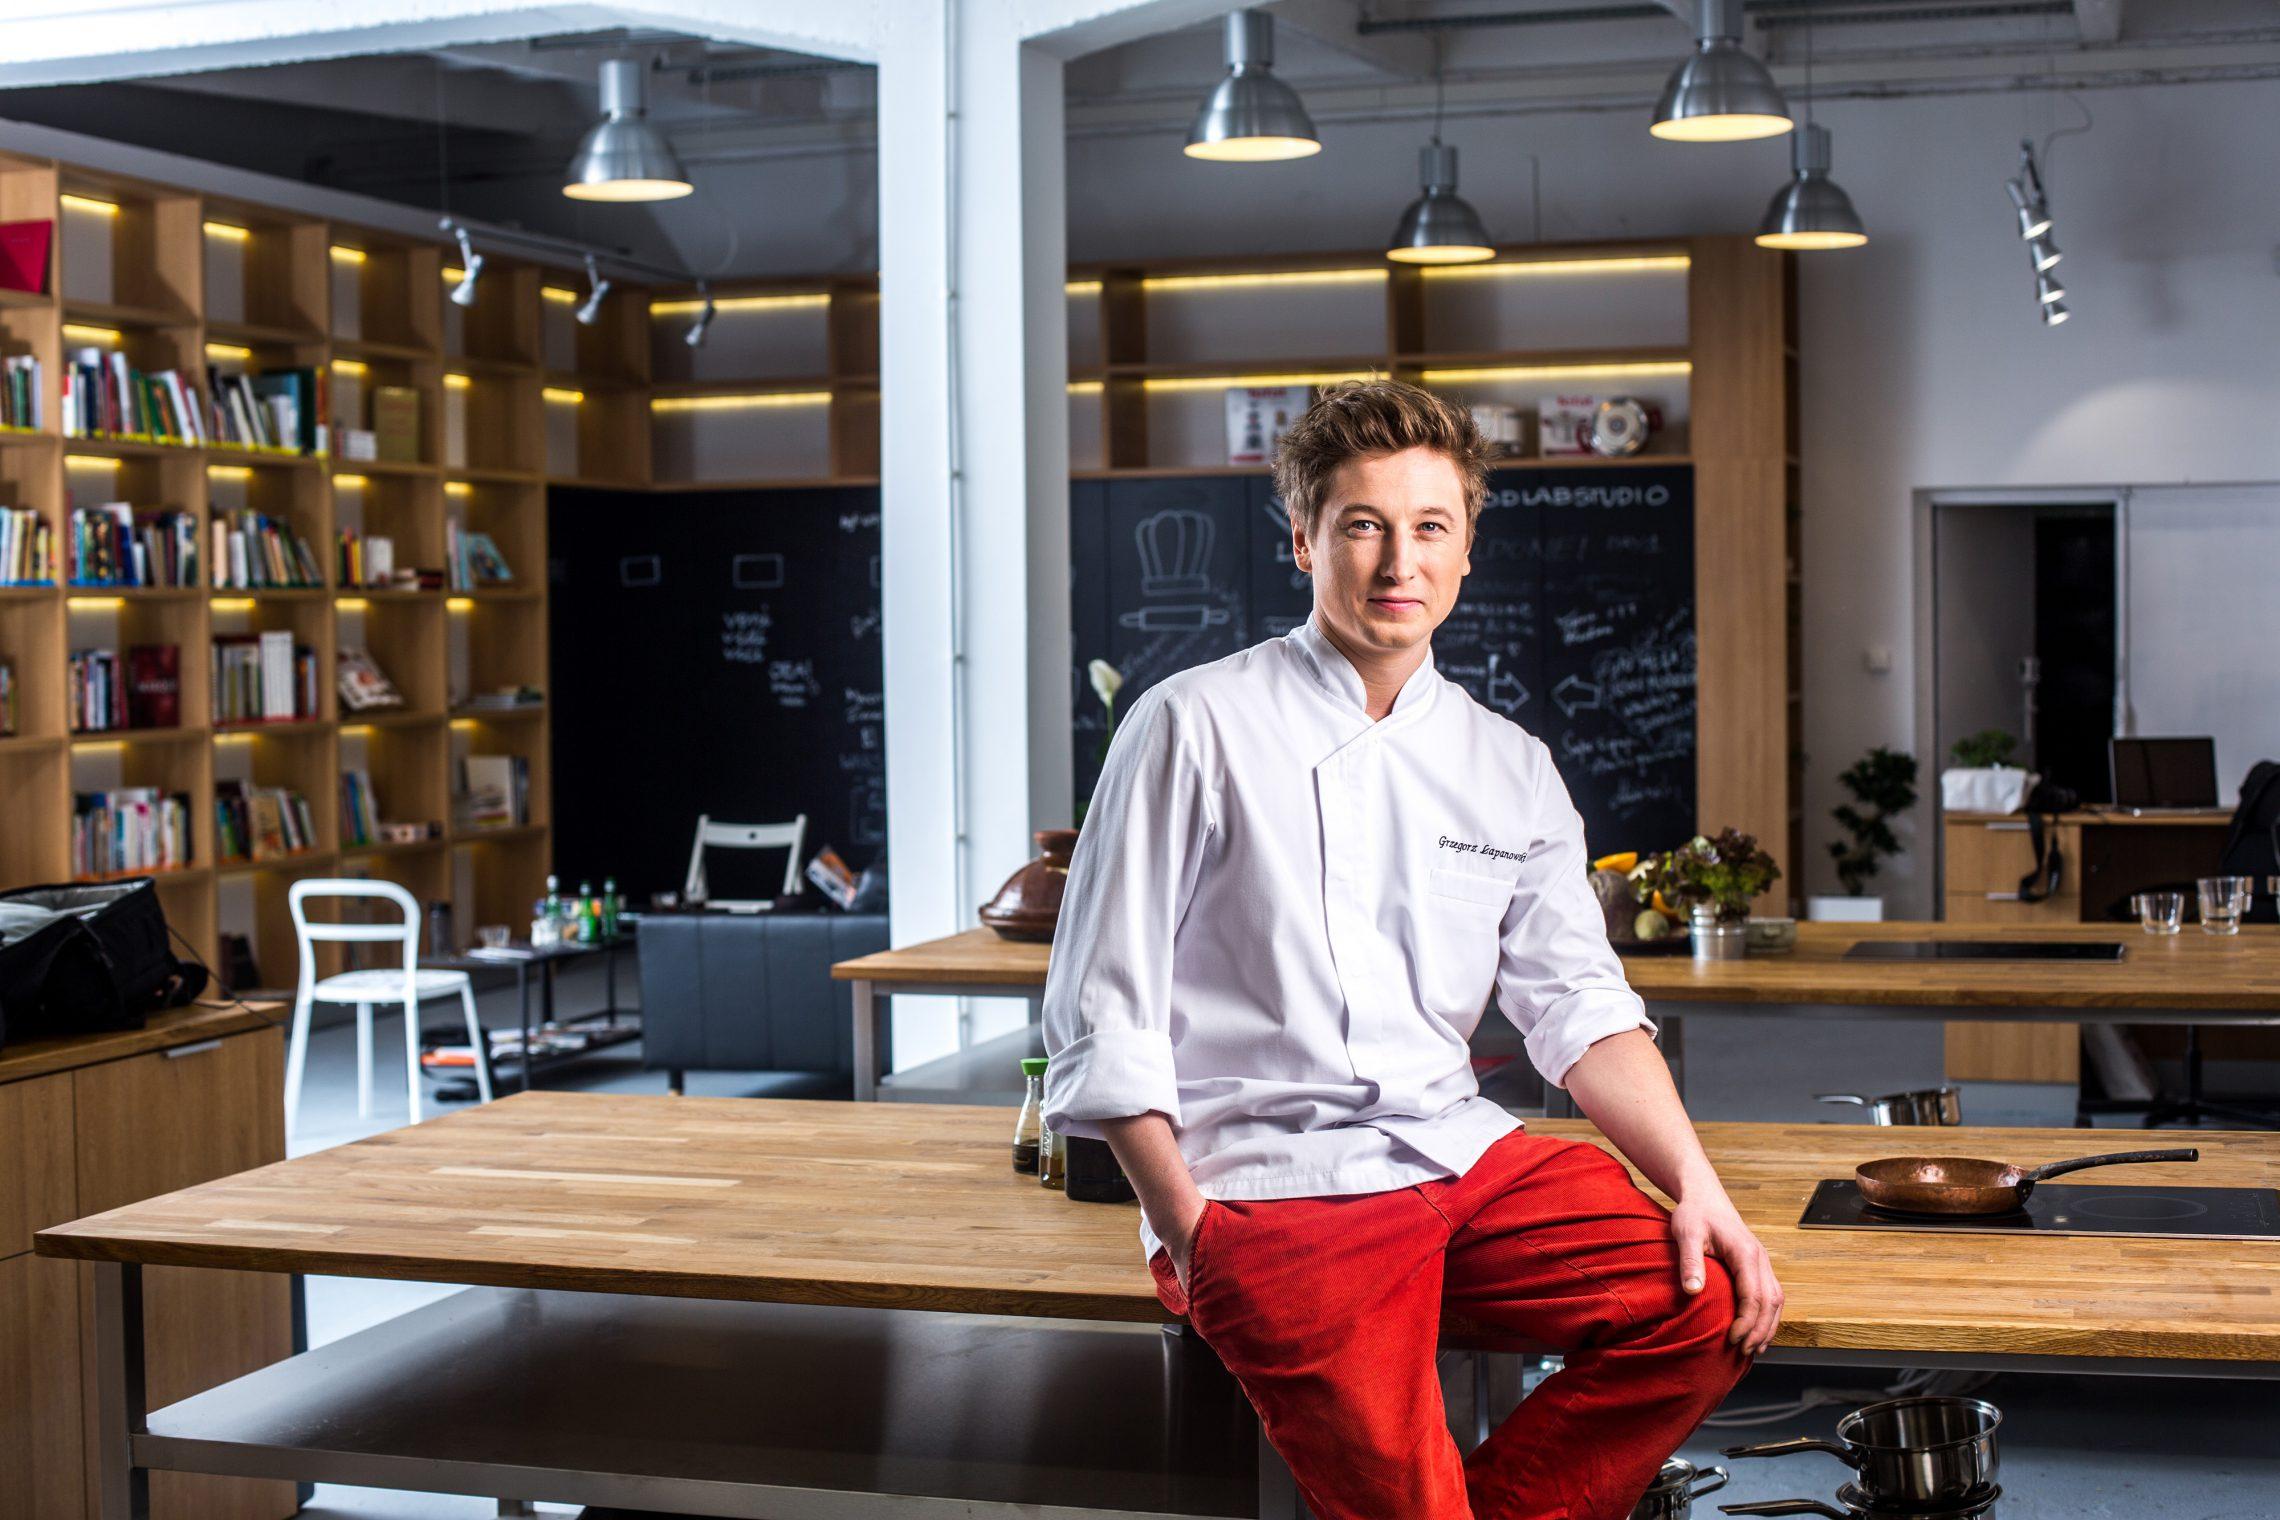 Food Lab Studio - paszport do świata kulinariów